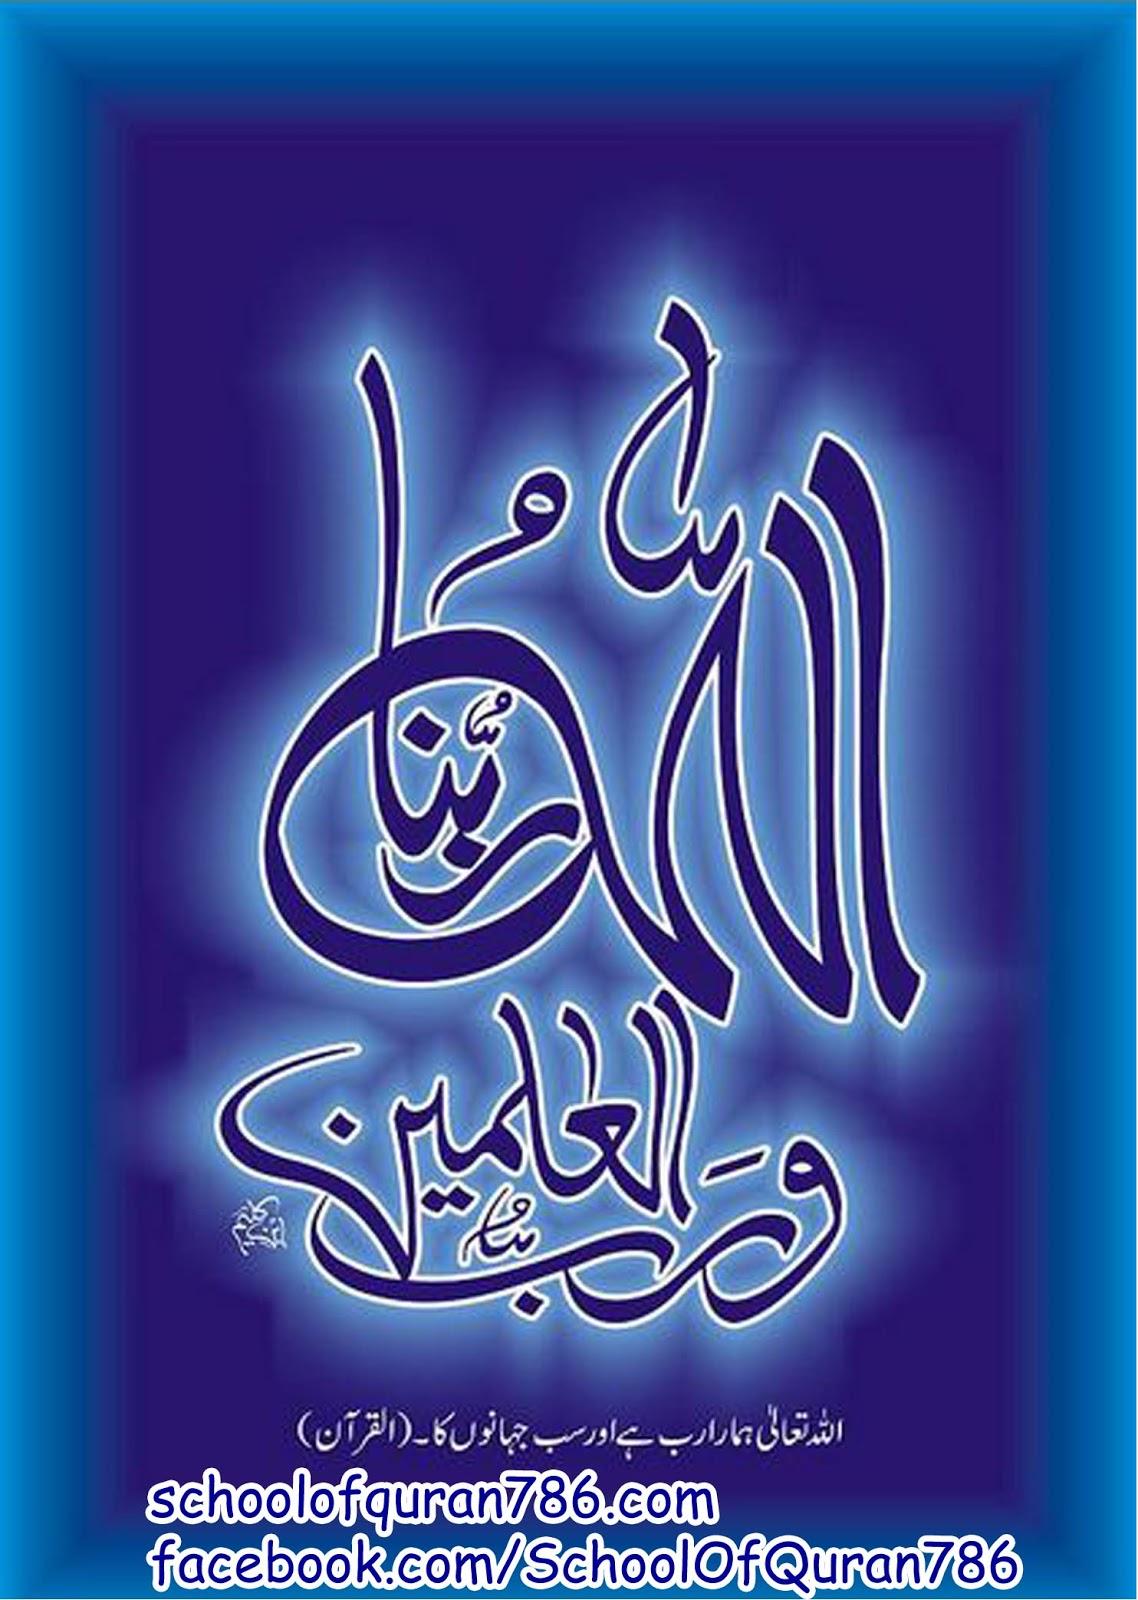 School of quran online teaching recitation learning